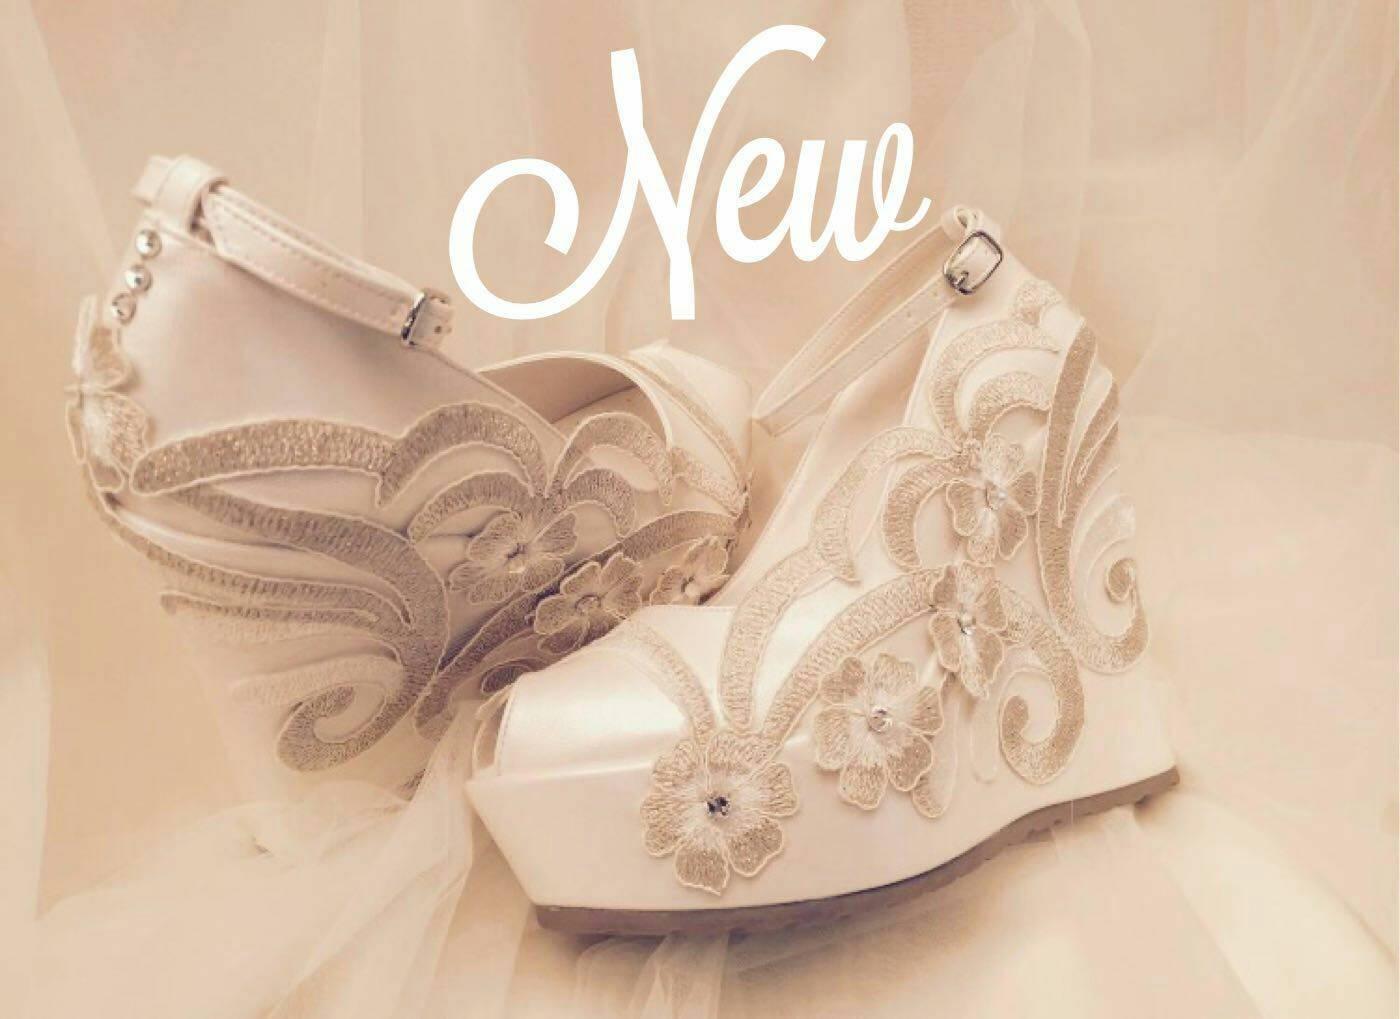 Wedge Heel Shoes For Wedding: Wedding Shoes Wedges Wedding Wedges Bridal Shoes İvory